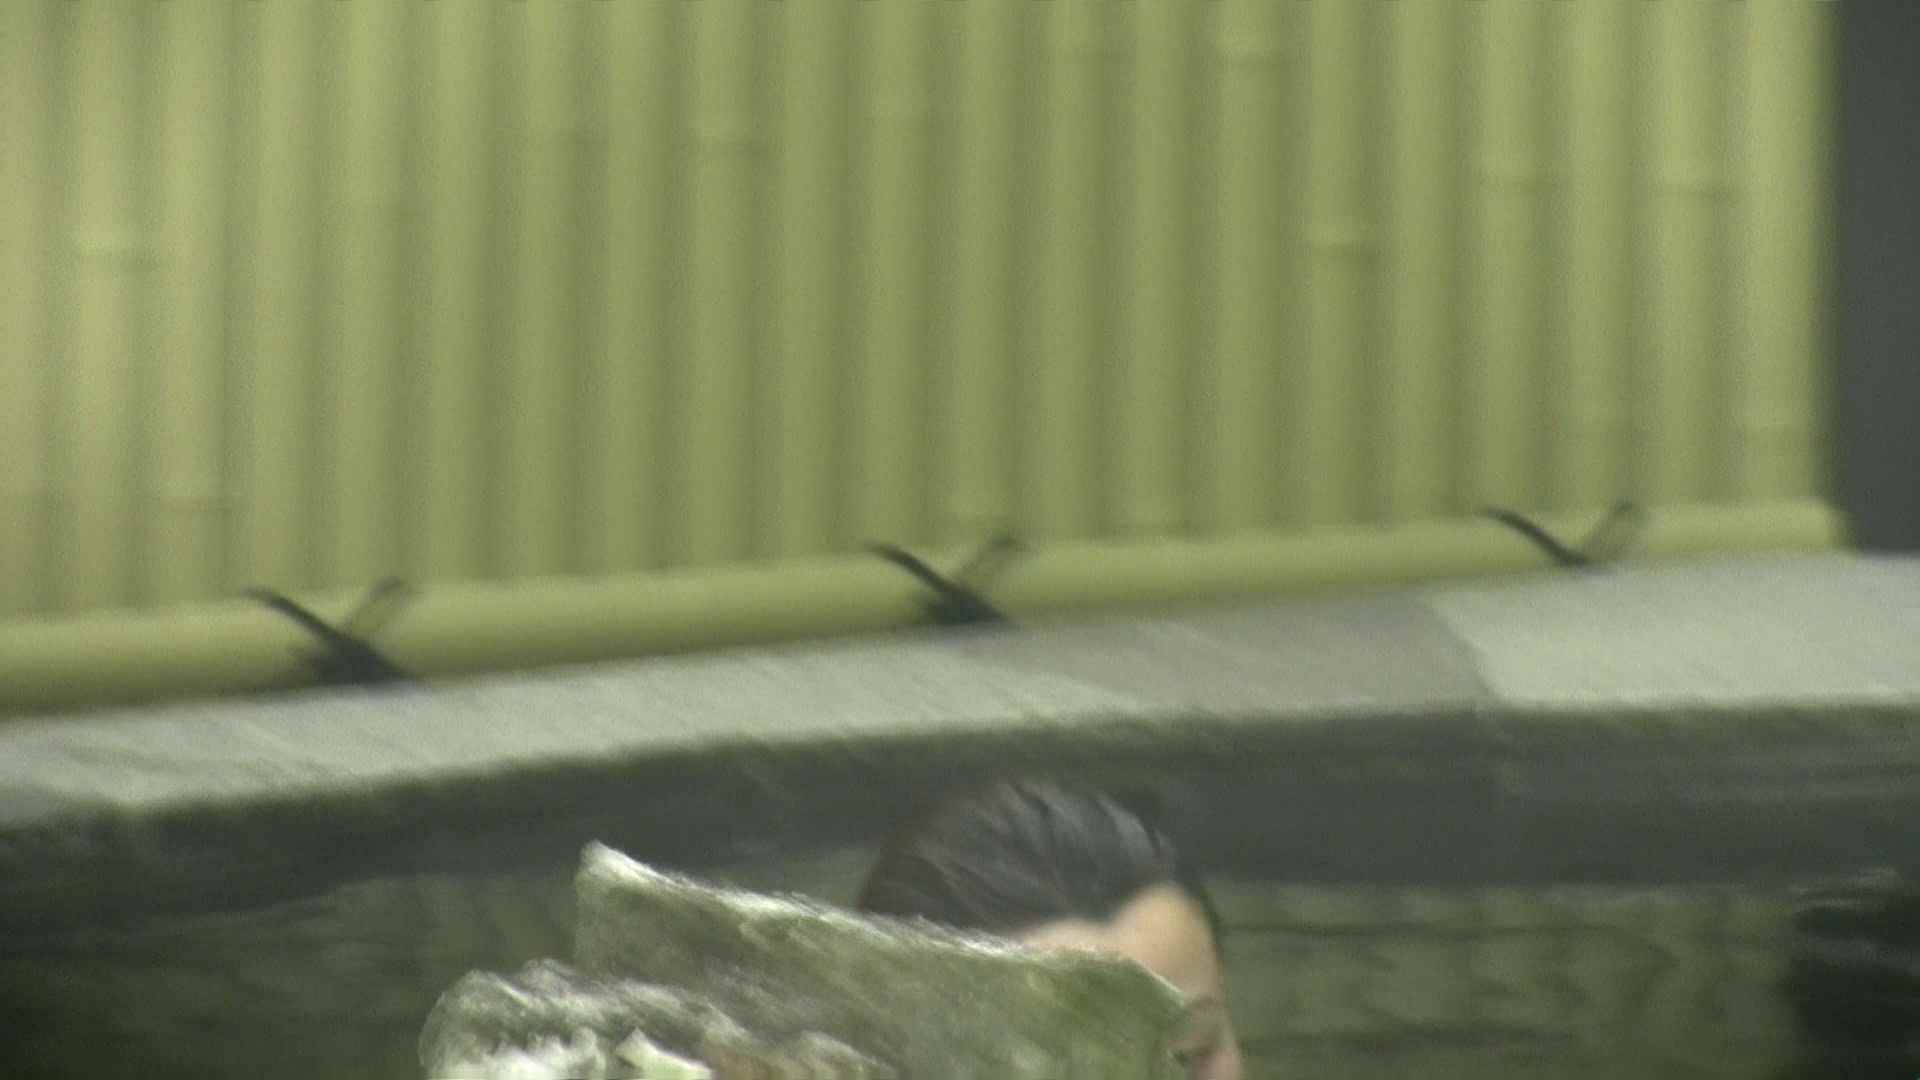 Aquaな露天風呂Vol.632 盗撮 | OLセックス  70画像 16